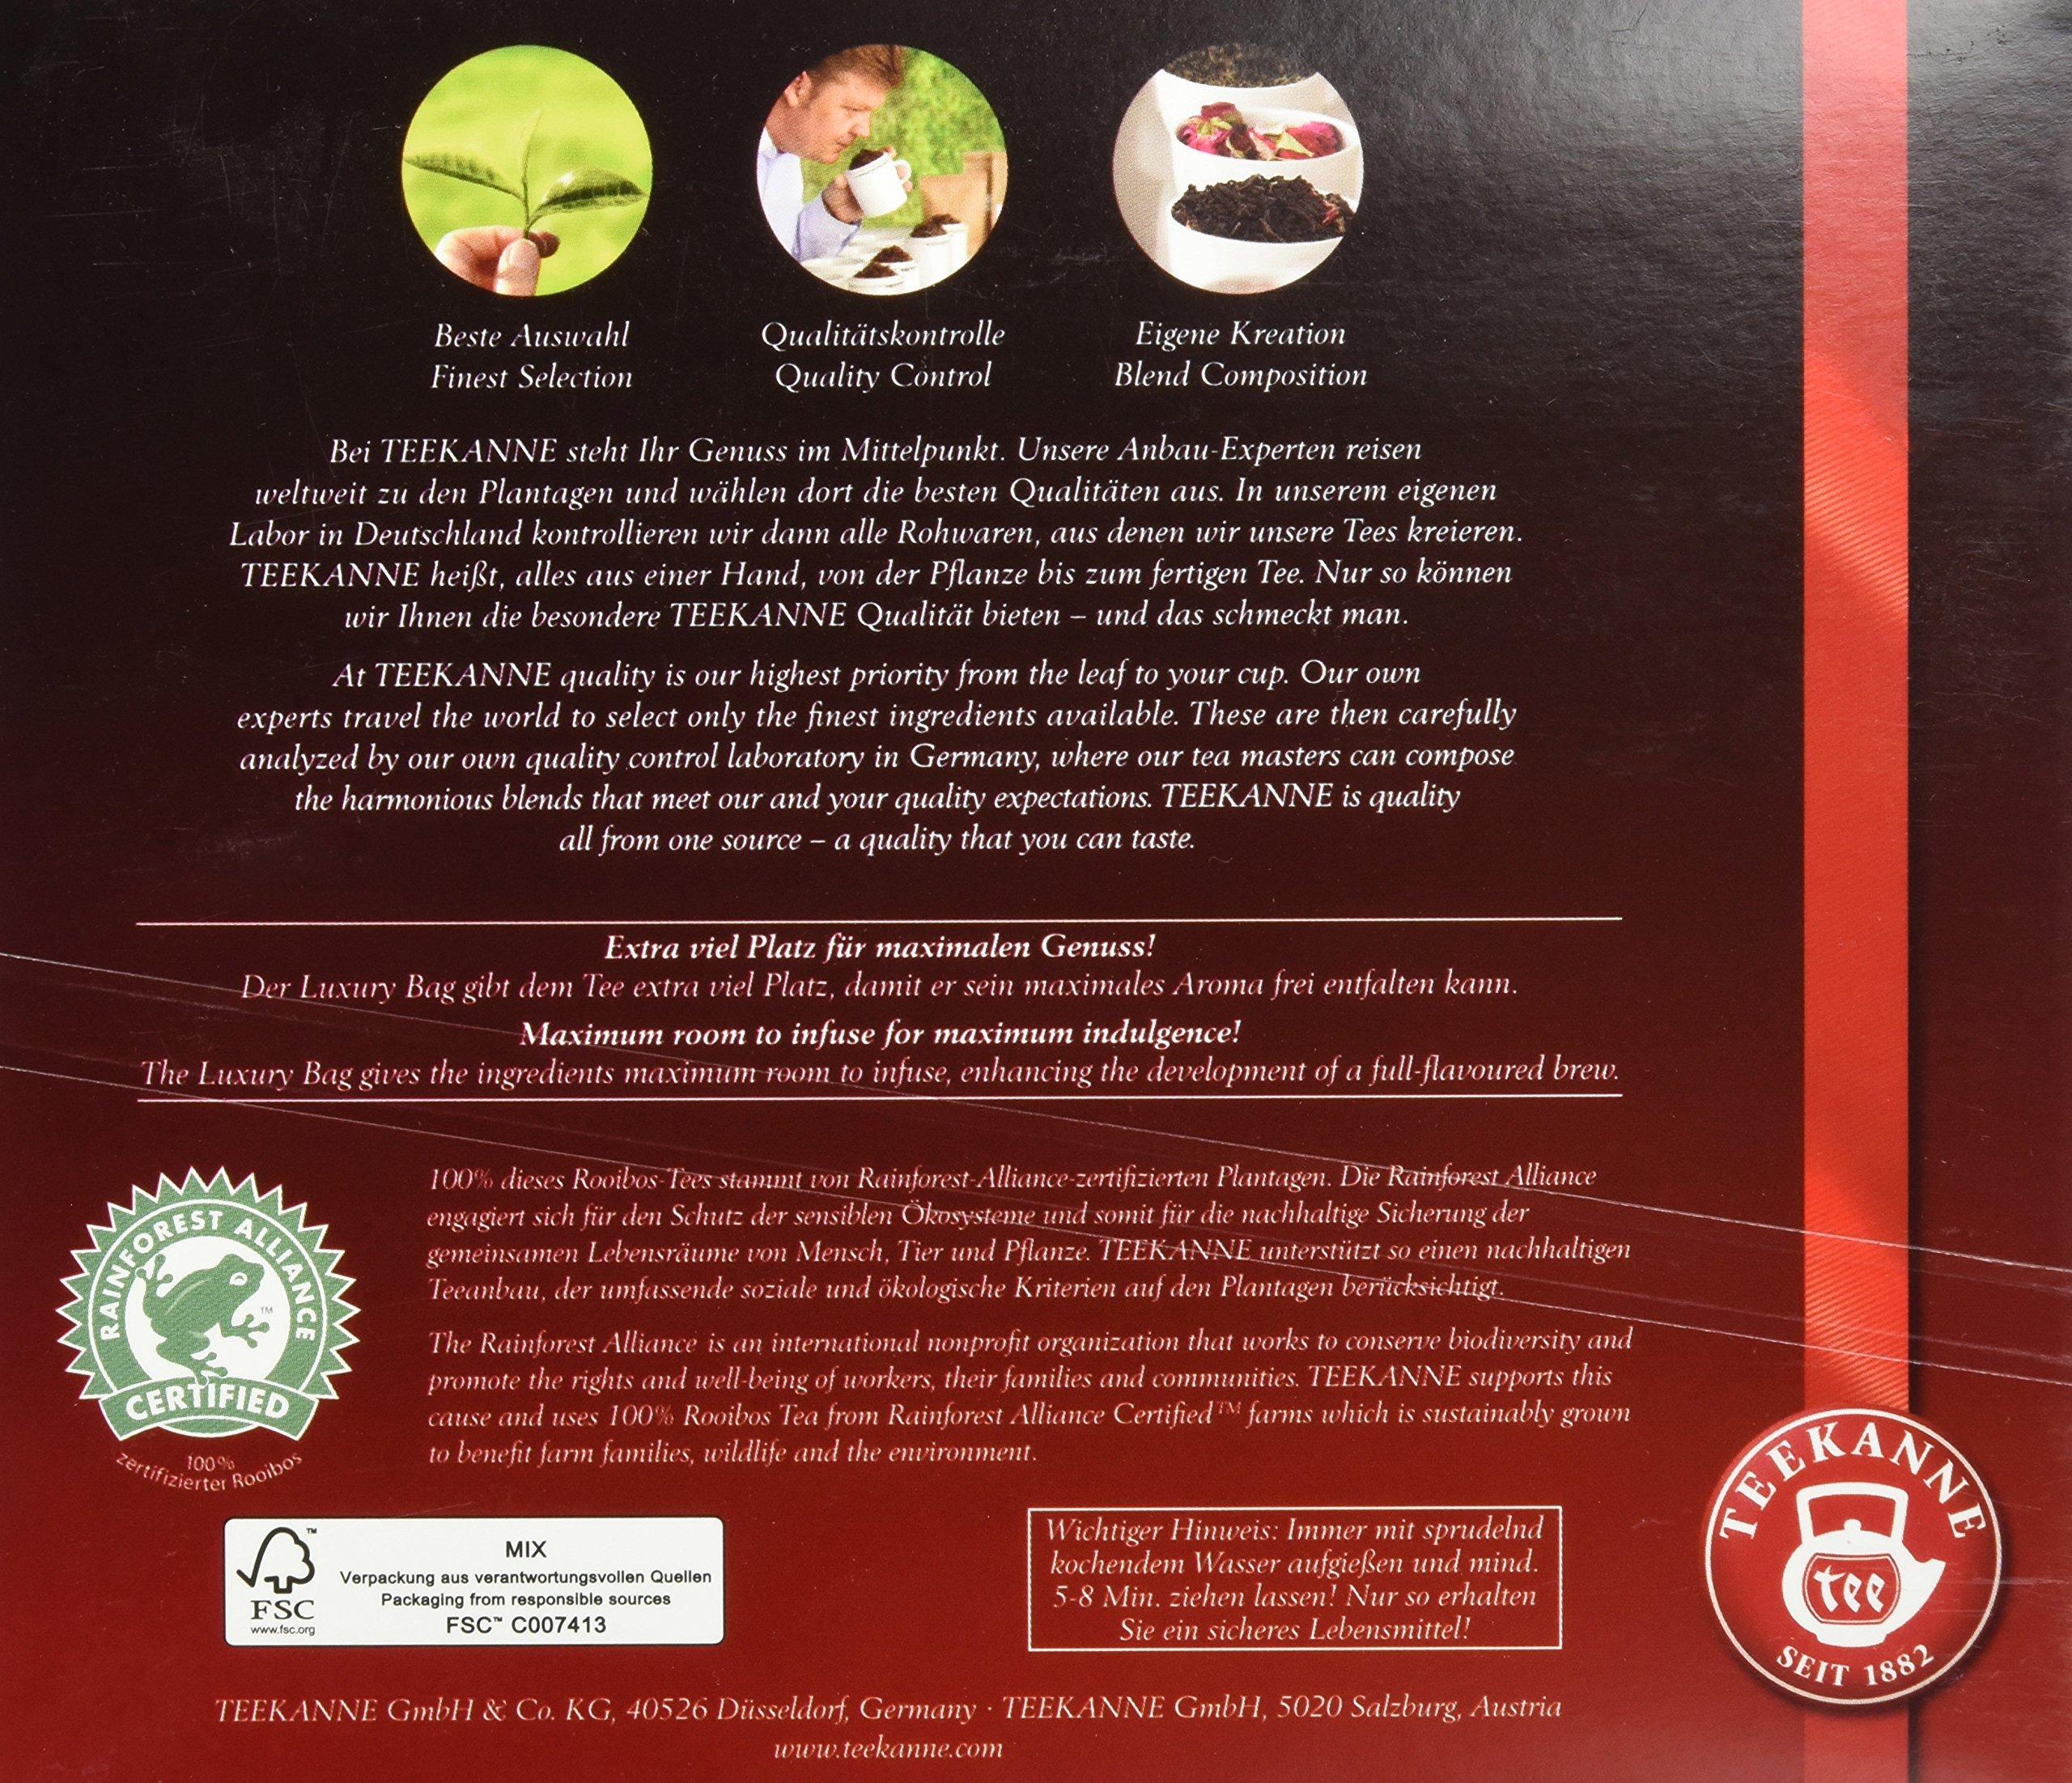 Teekanne-Selection-1882-im-Luxury-Bag-Rooibos-Vanille-mild-koffeinfrei-20-Portionen-1er-Pack-1-x-80-g